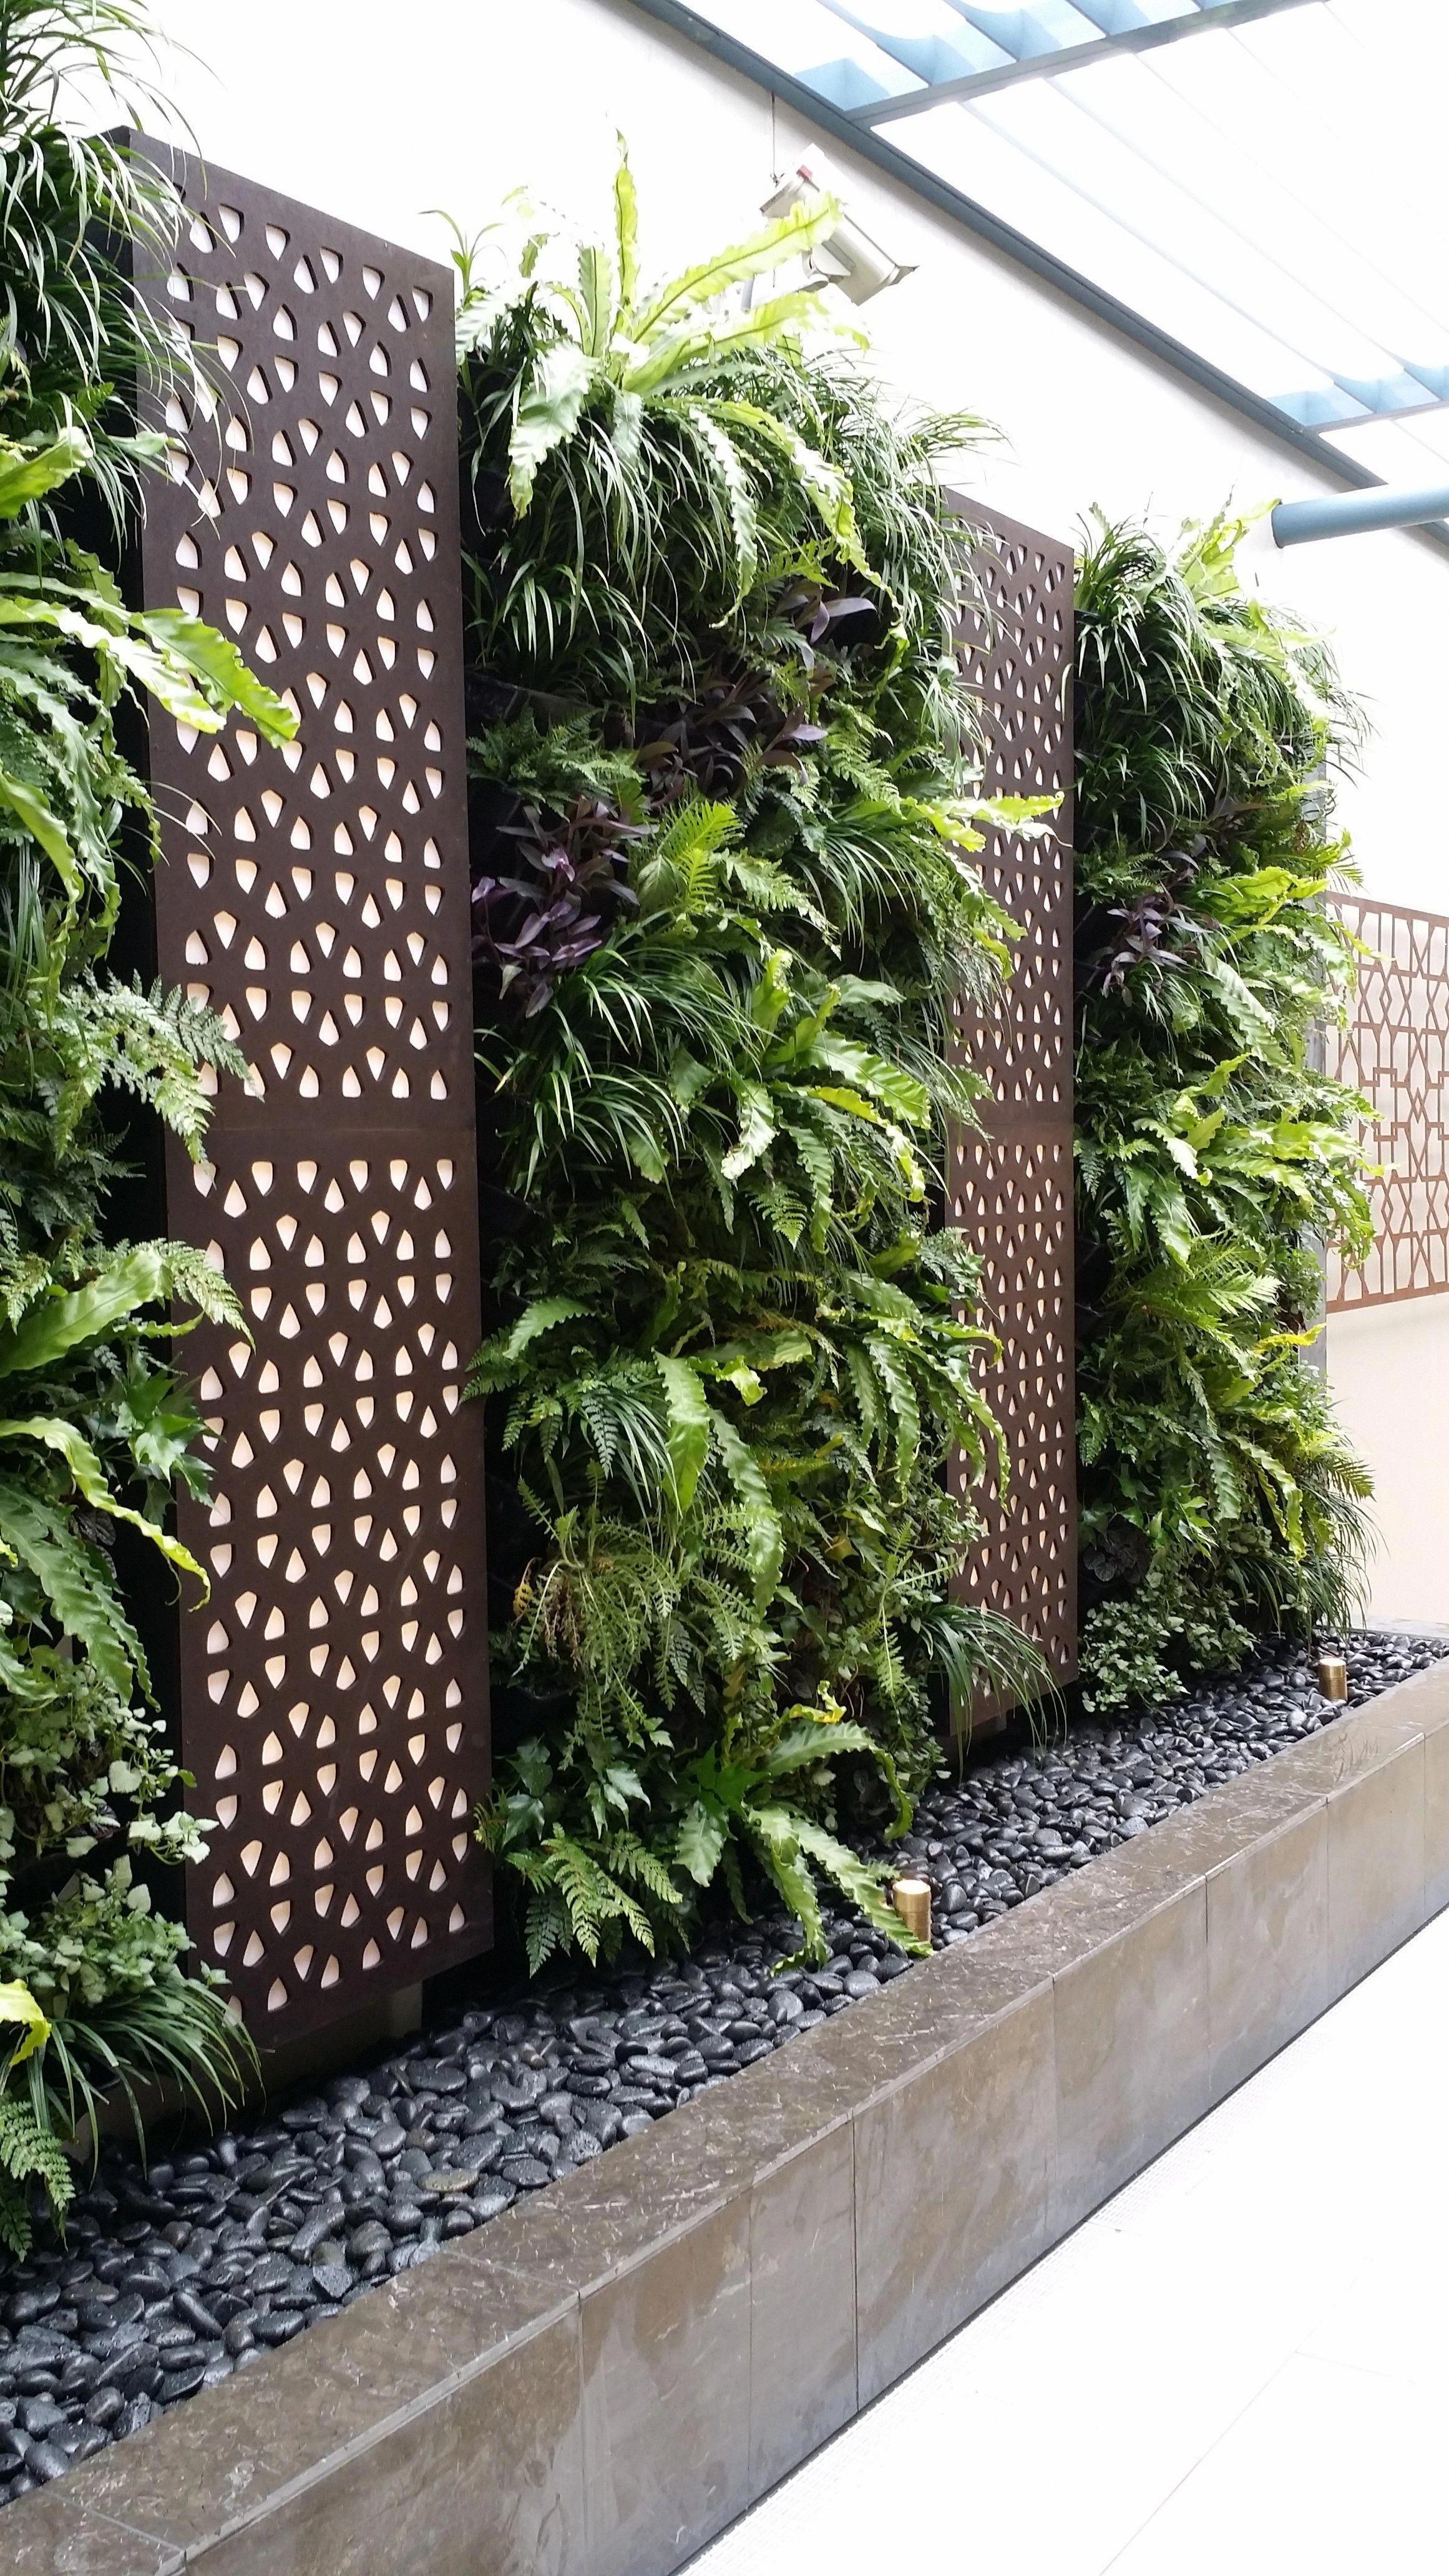 Best Gardening Websites Gardeningshoes With Images Vertical